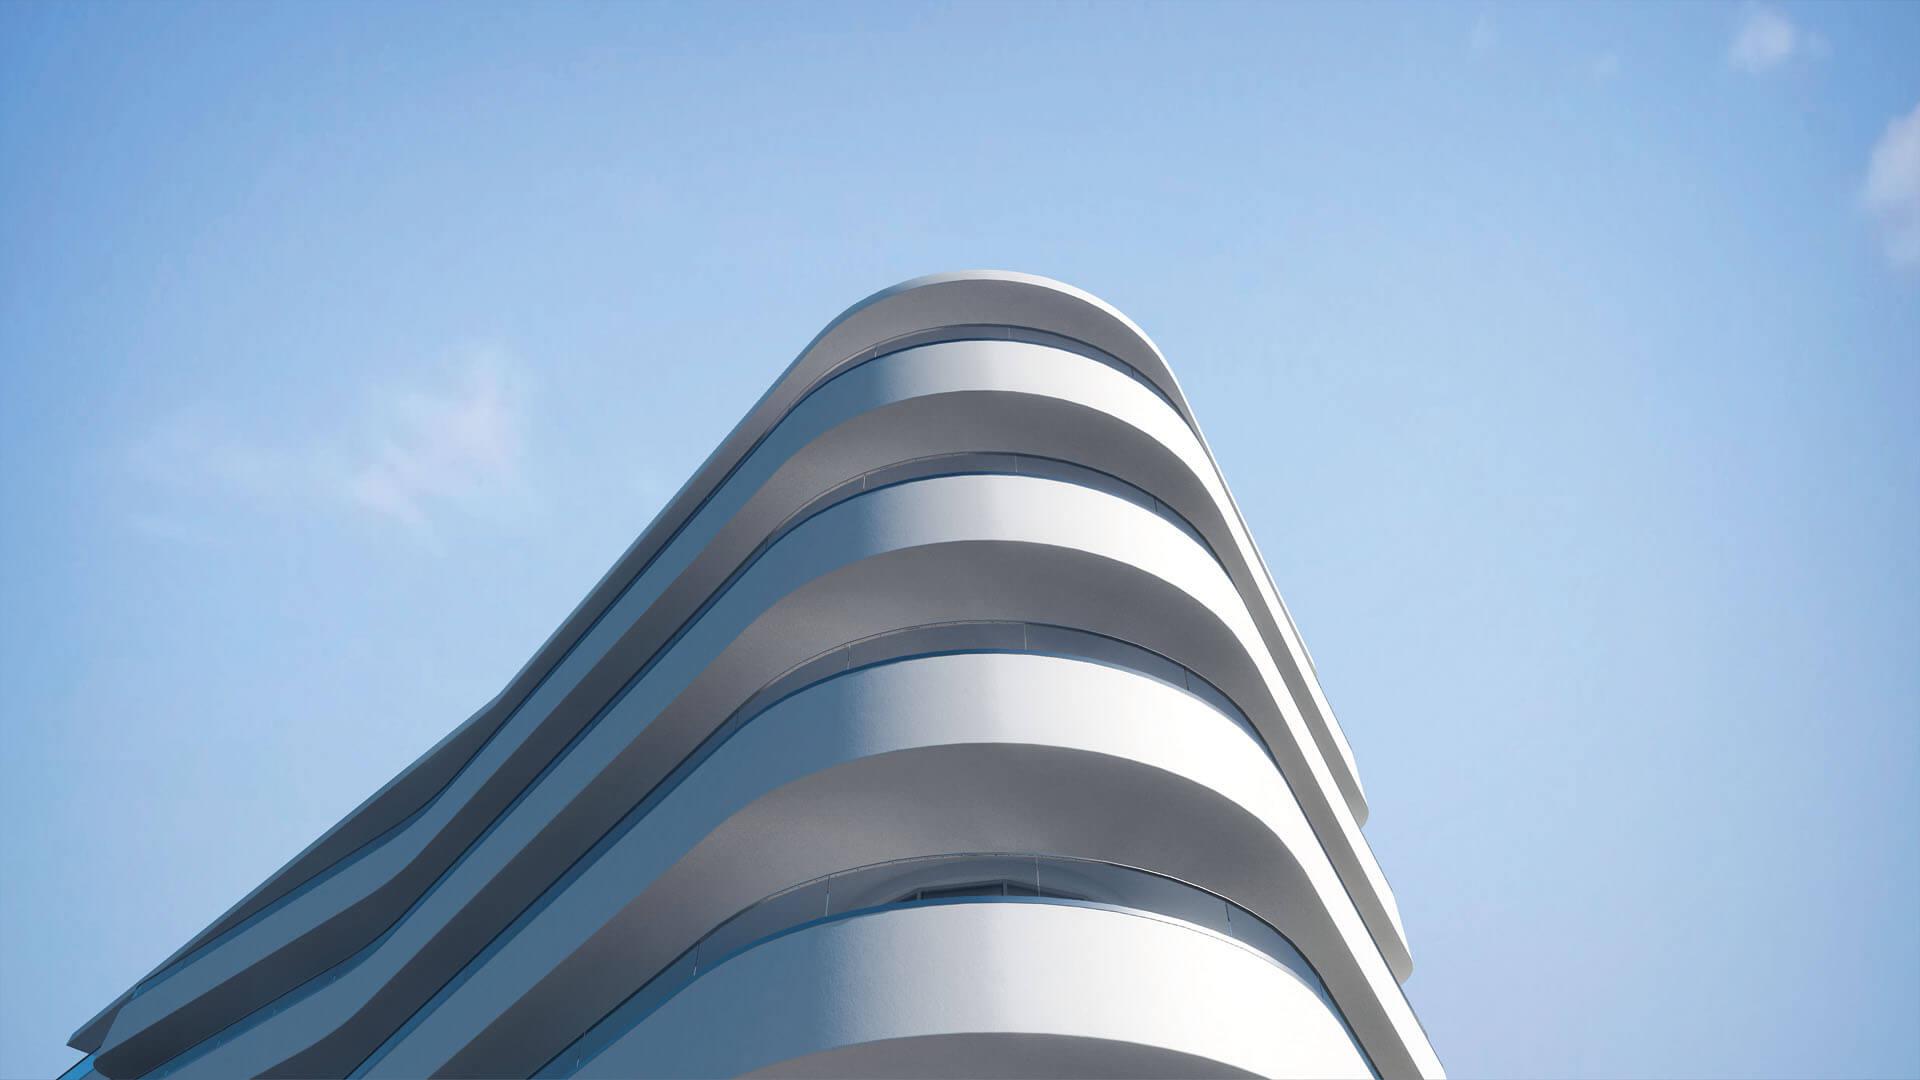 McCarthy&Stone_ParkstoneRd_Horizons_Curved Exterior